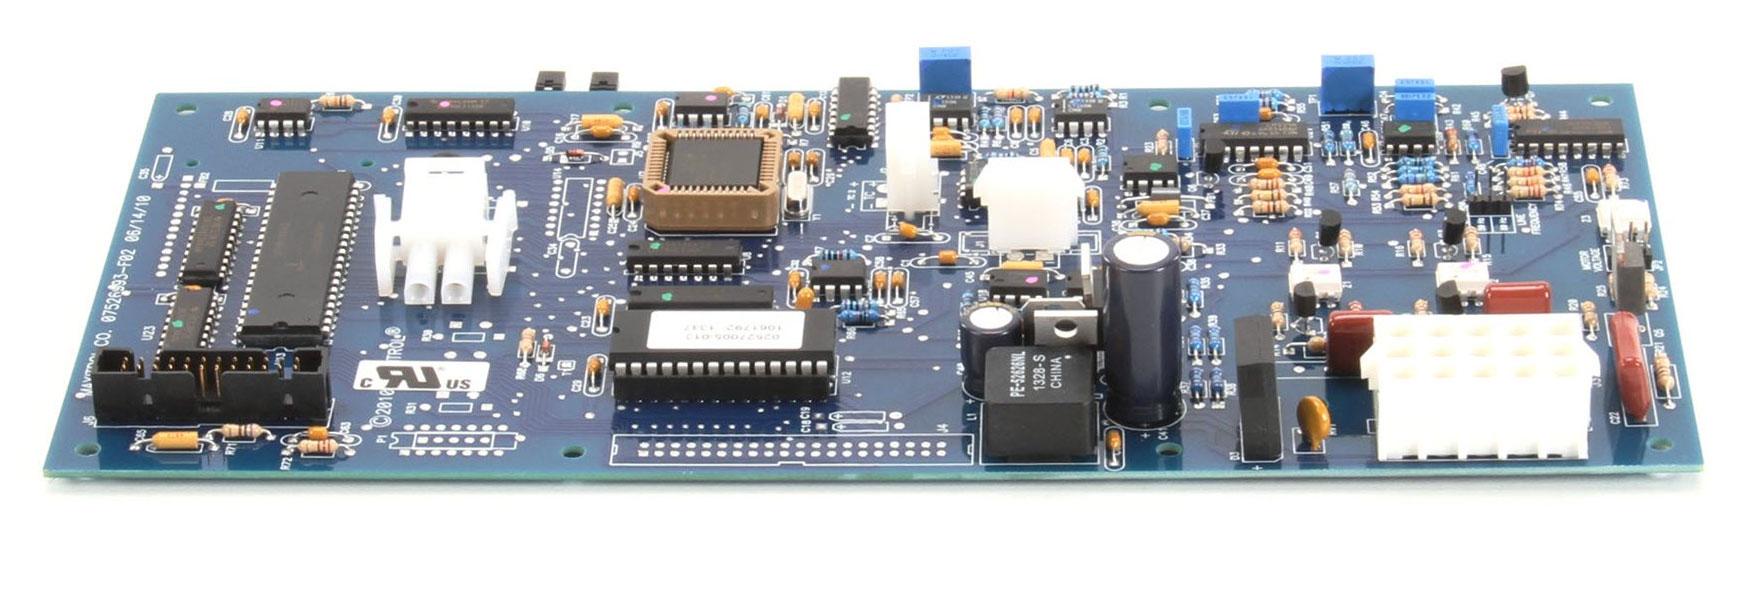 Home Lincoln Oven Wiring Diagram 370417 Control Board